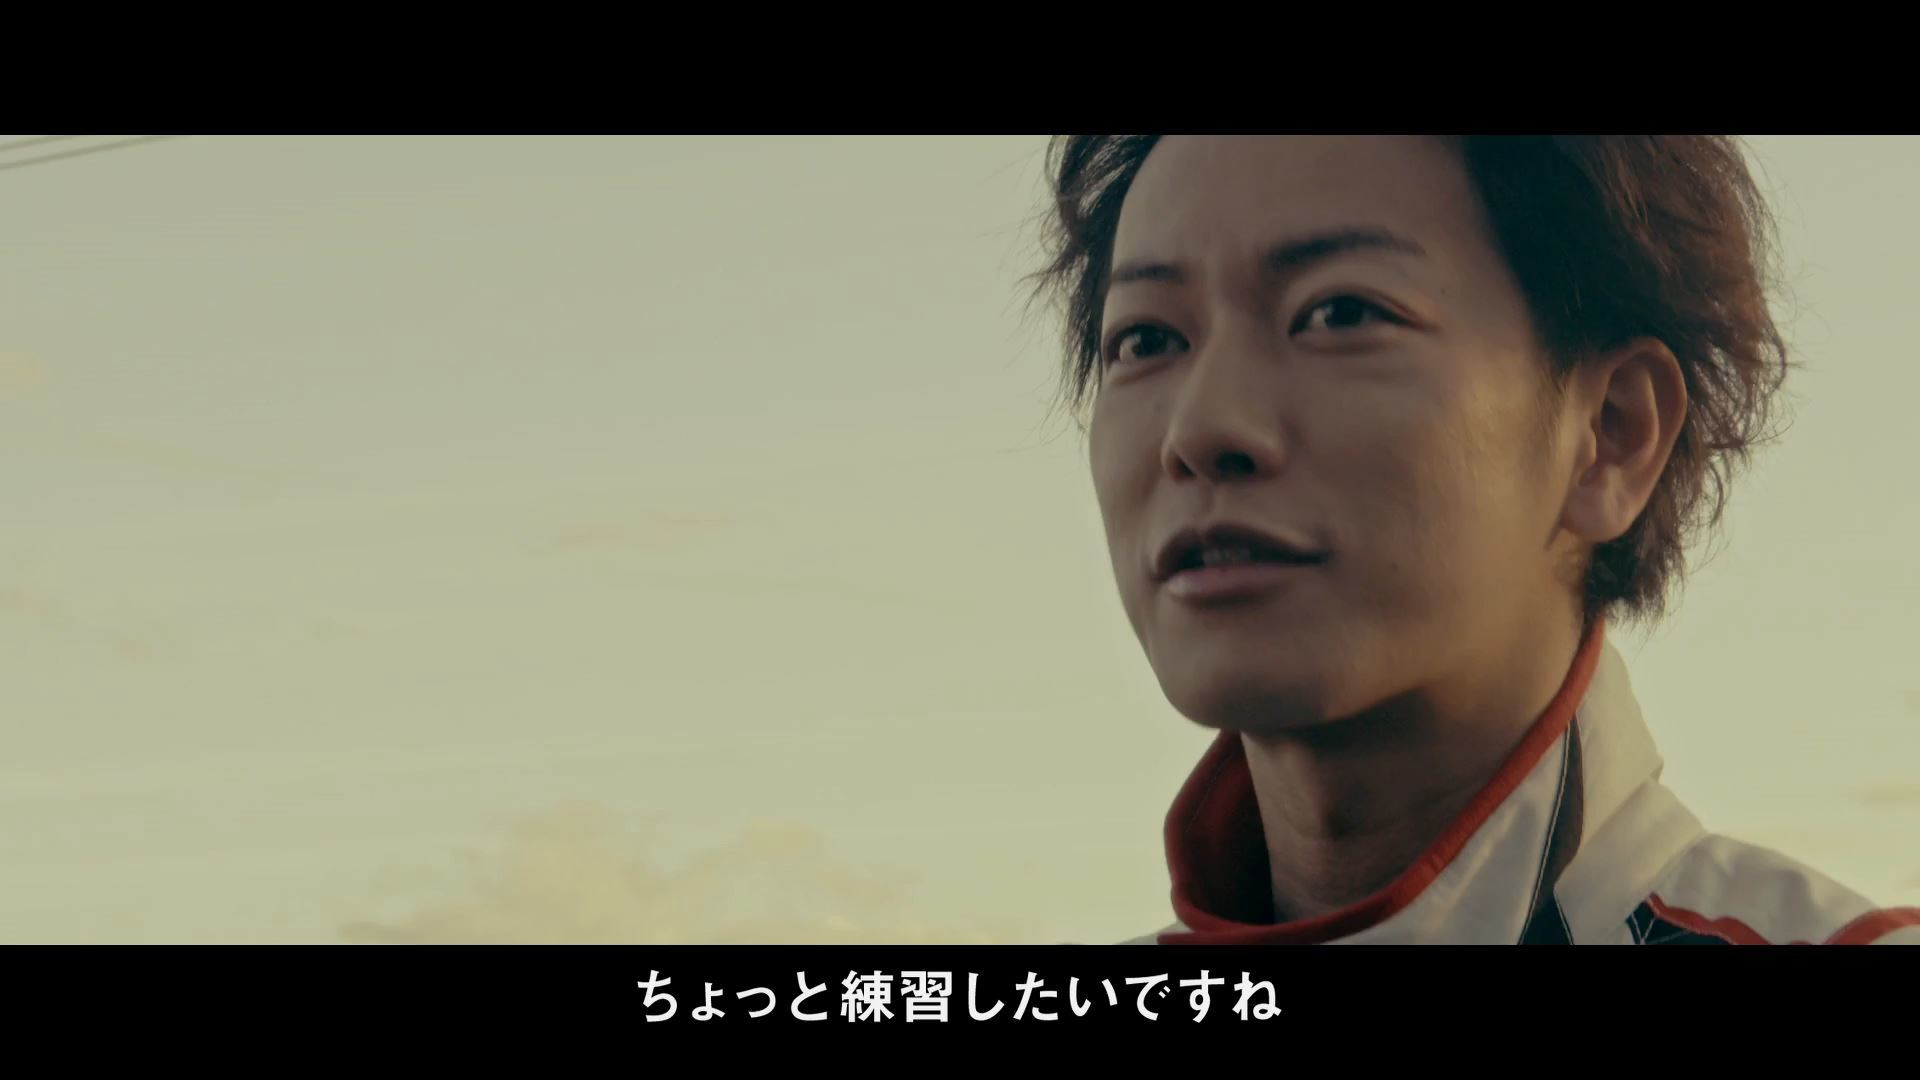 「TAKERU SATOH meets GAZOO MORIZO篇」